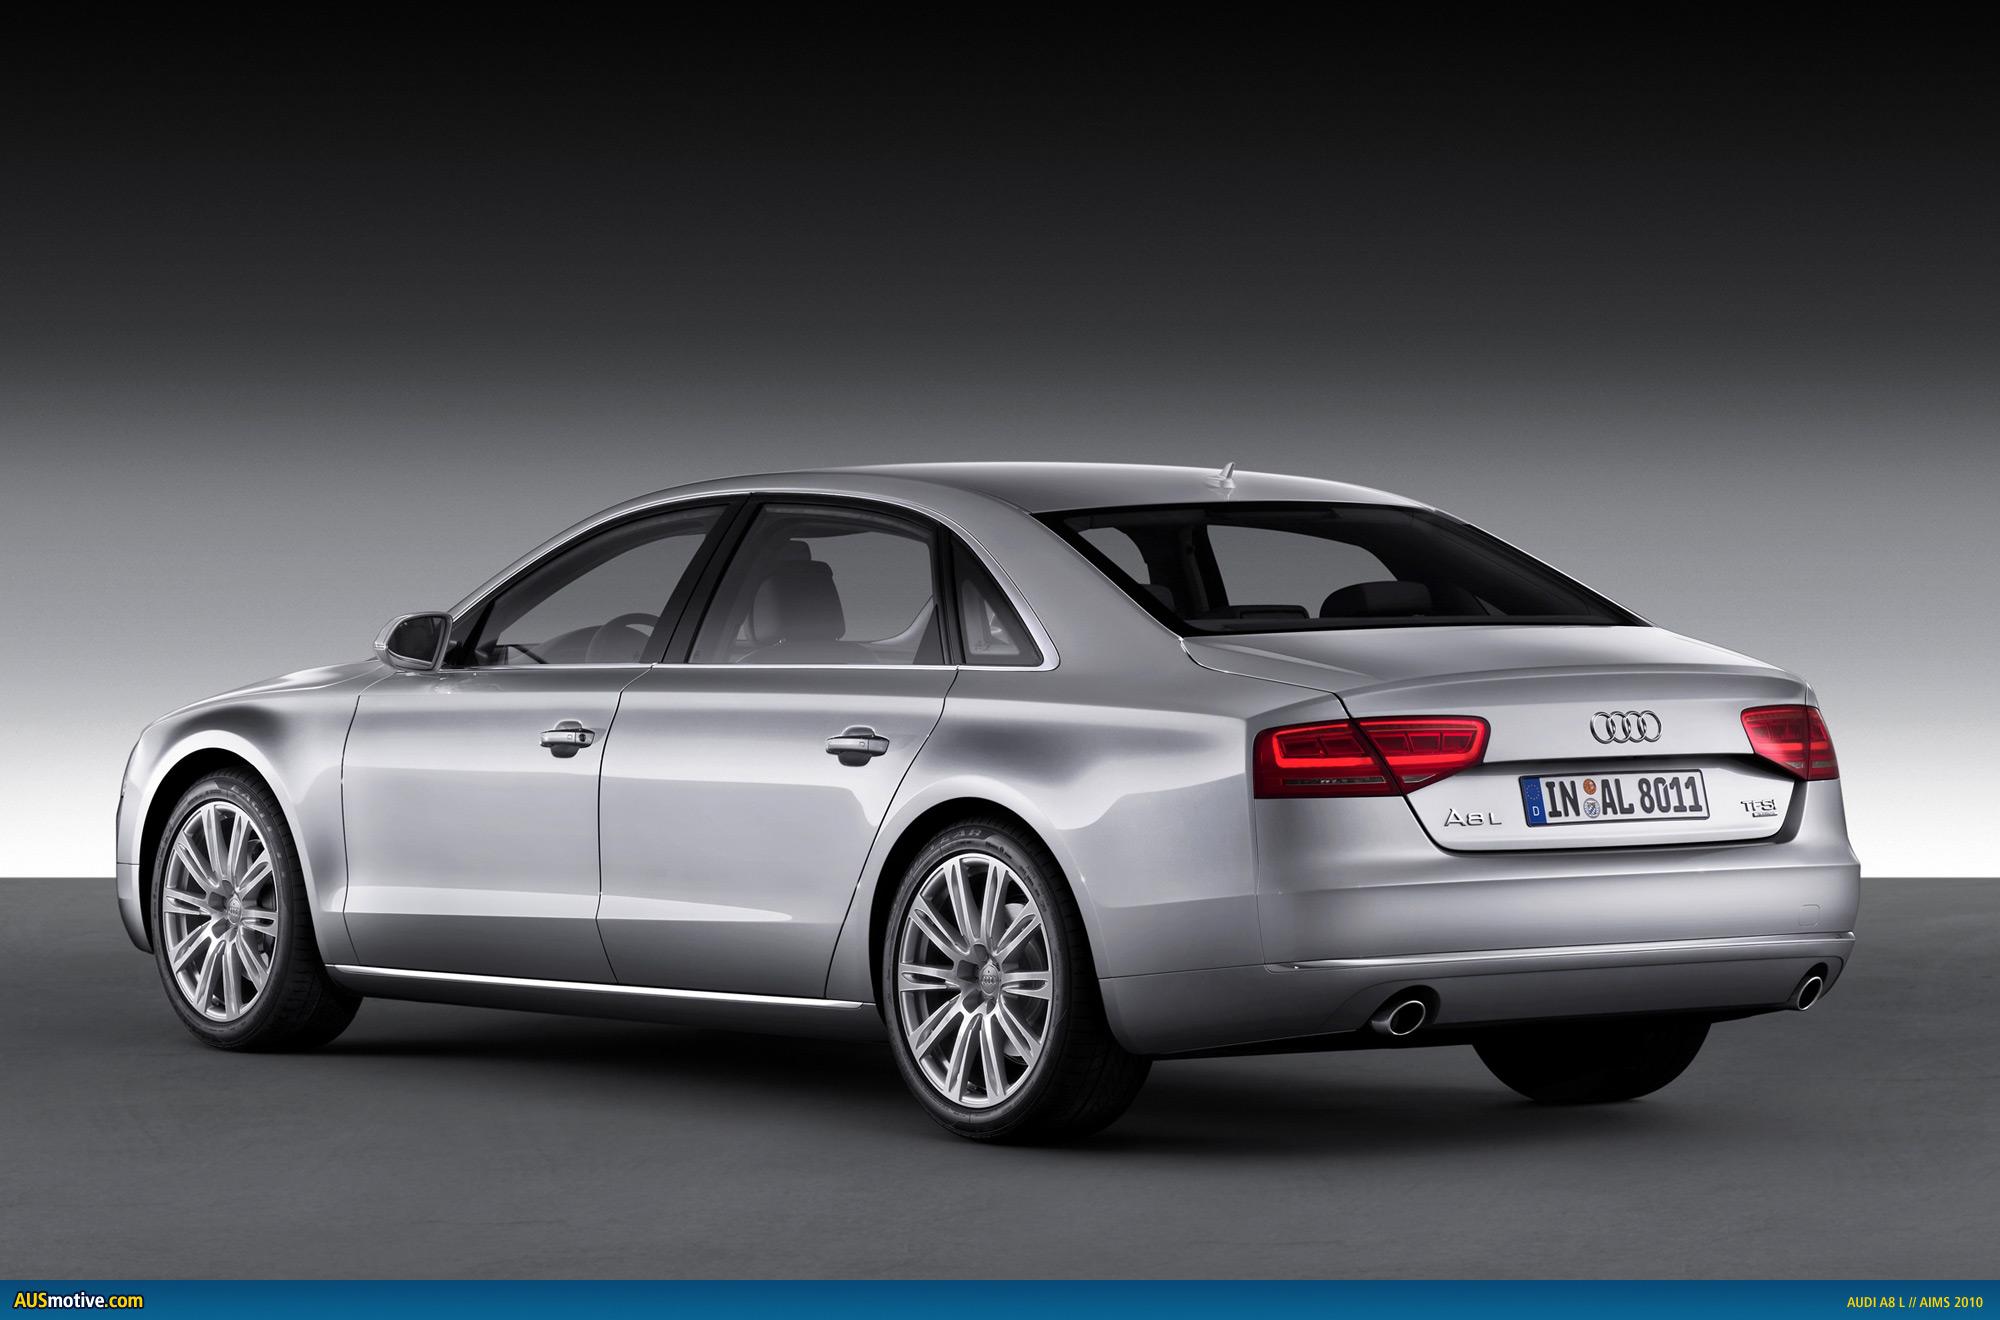 2010 Audi A8 Image 15